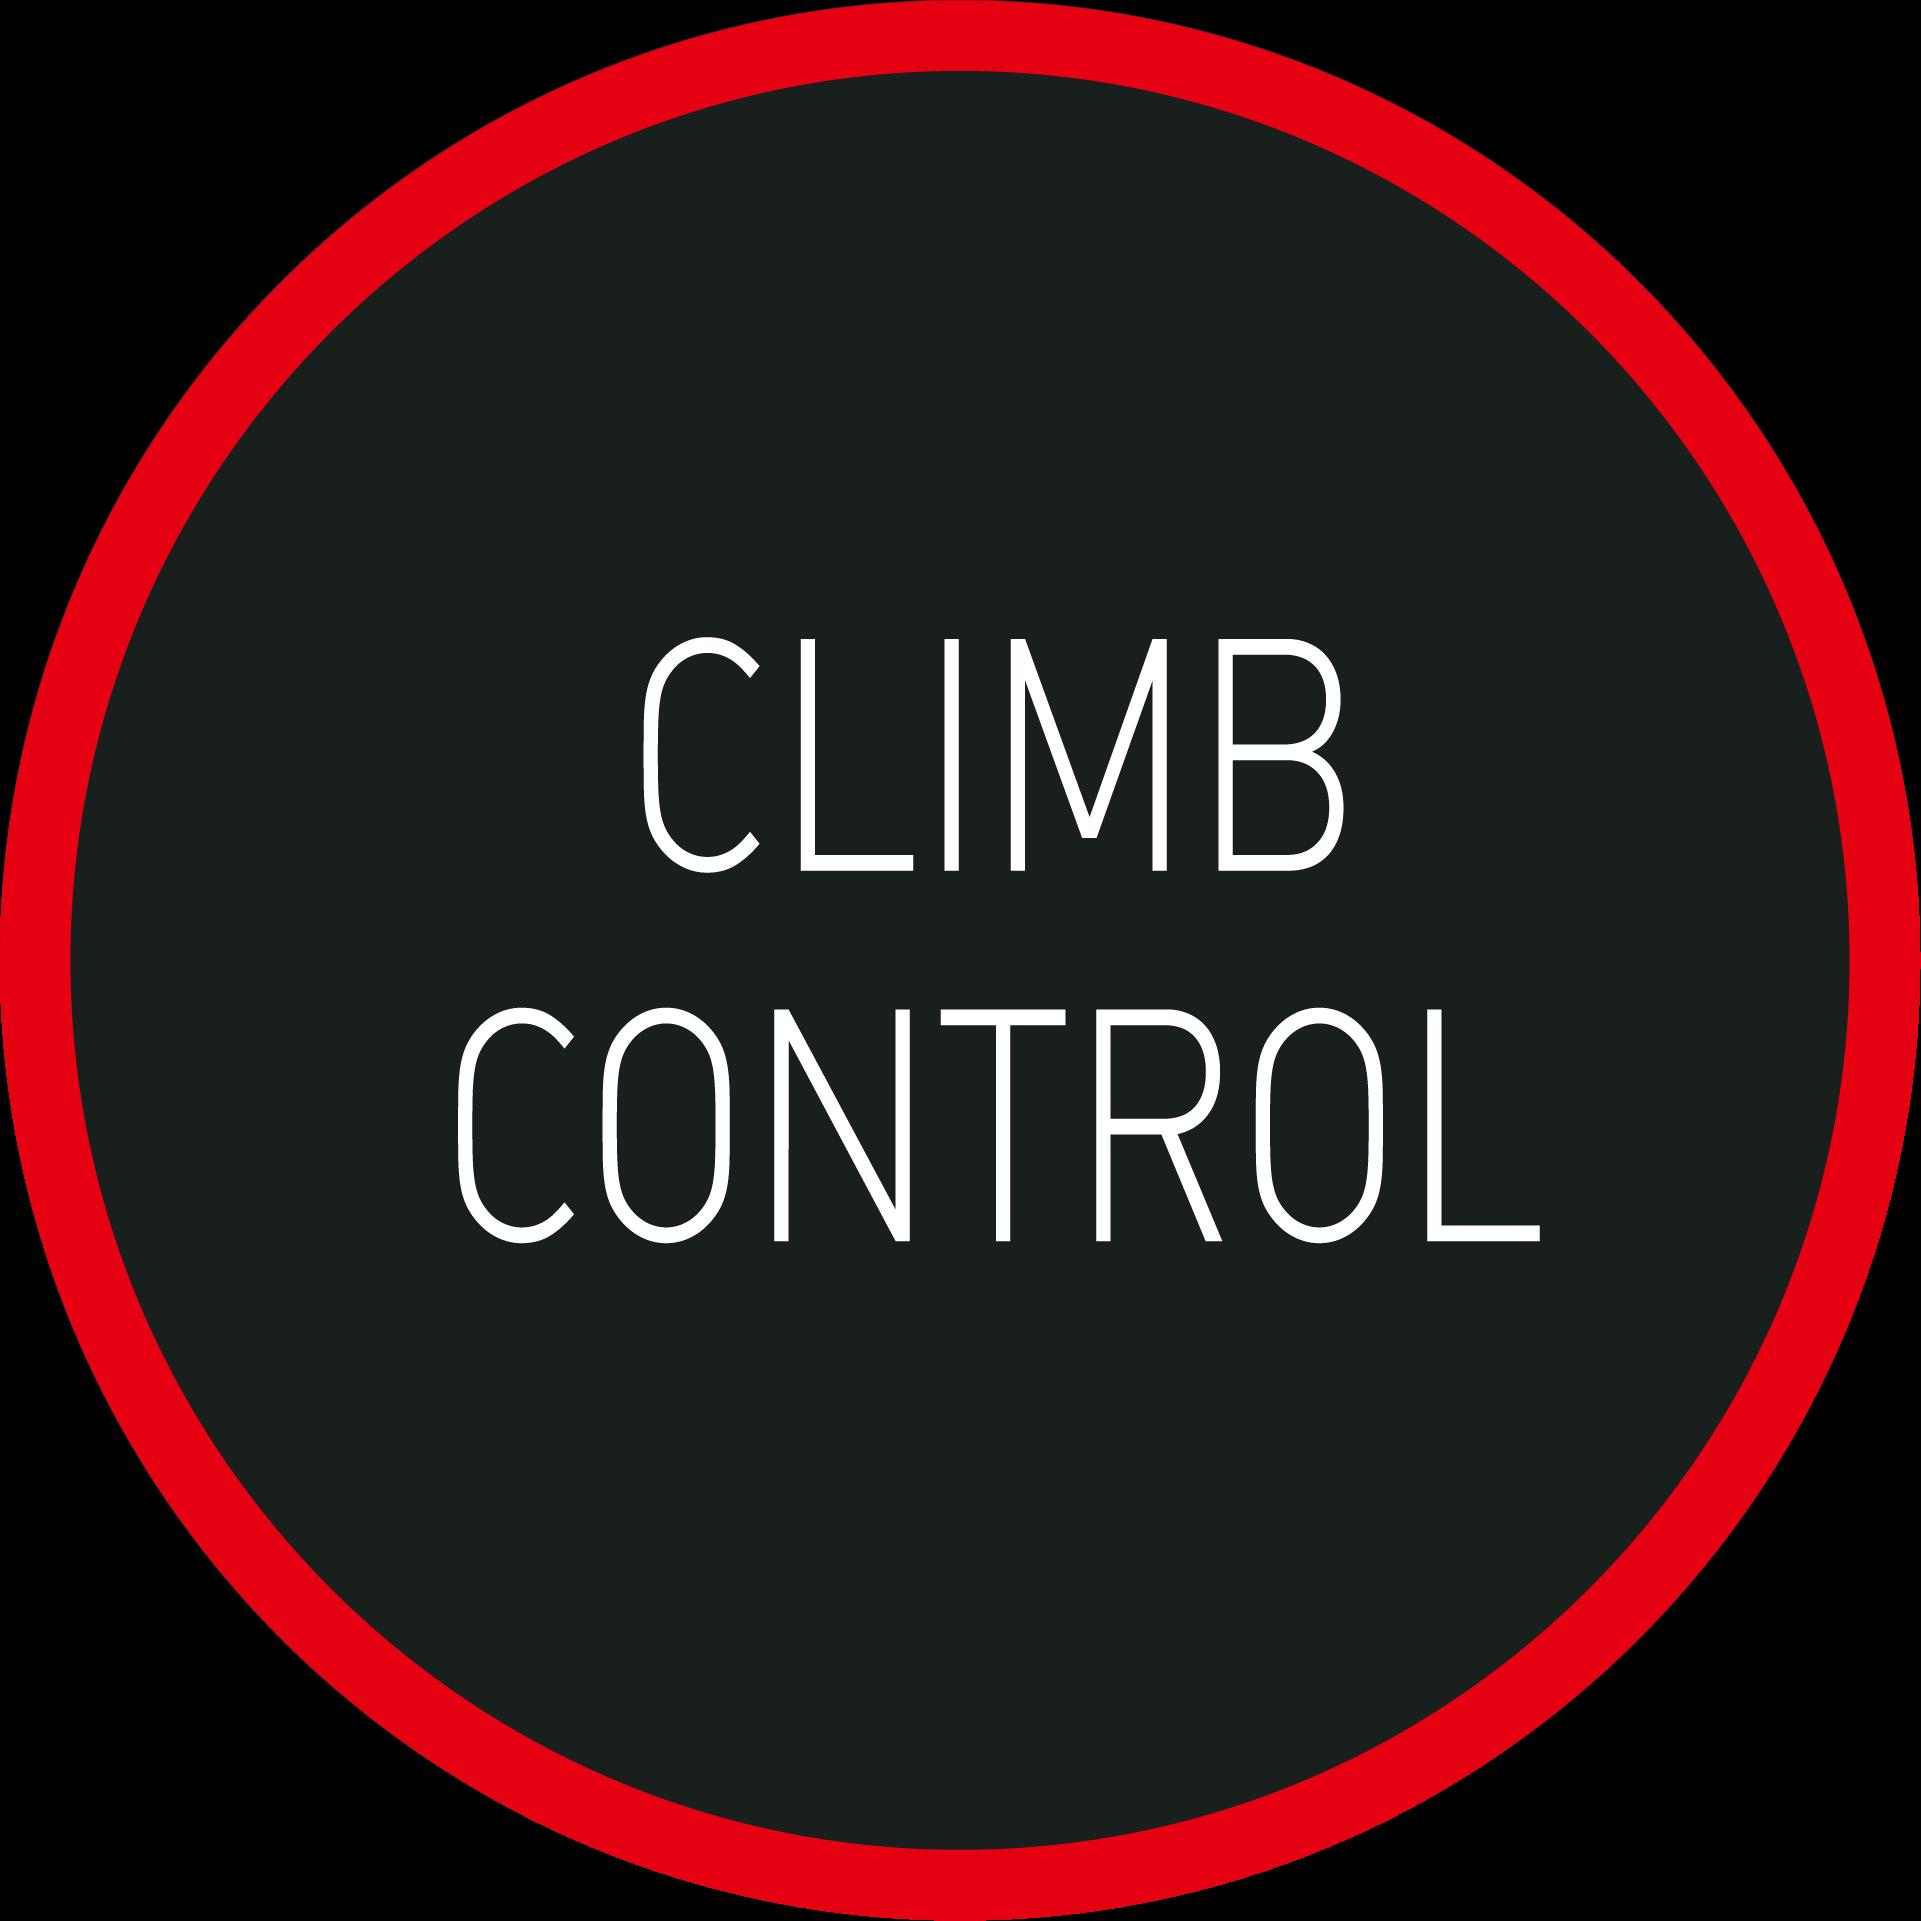 Selle-Italia-icon-02-climb-control